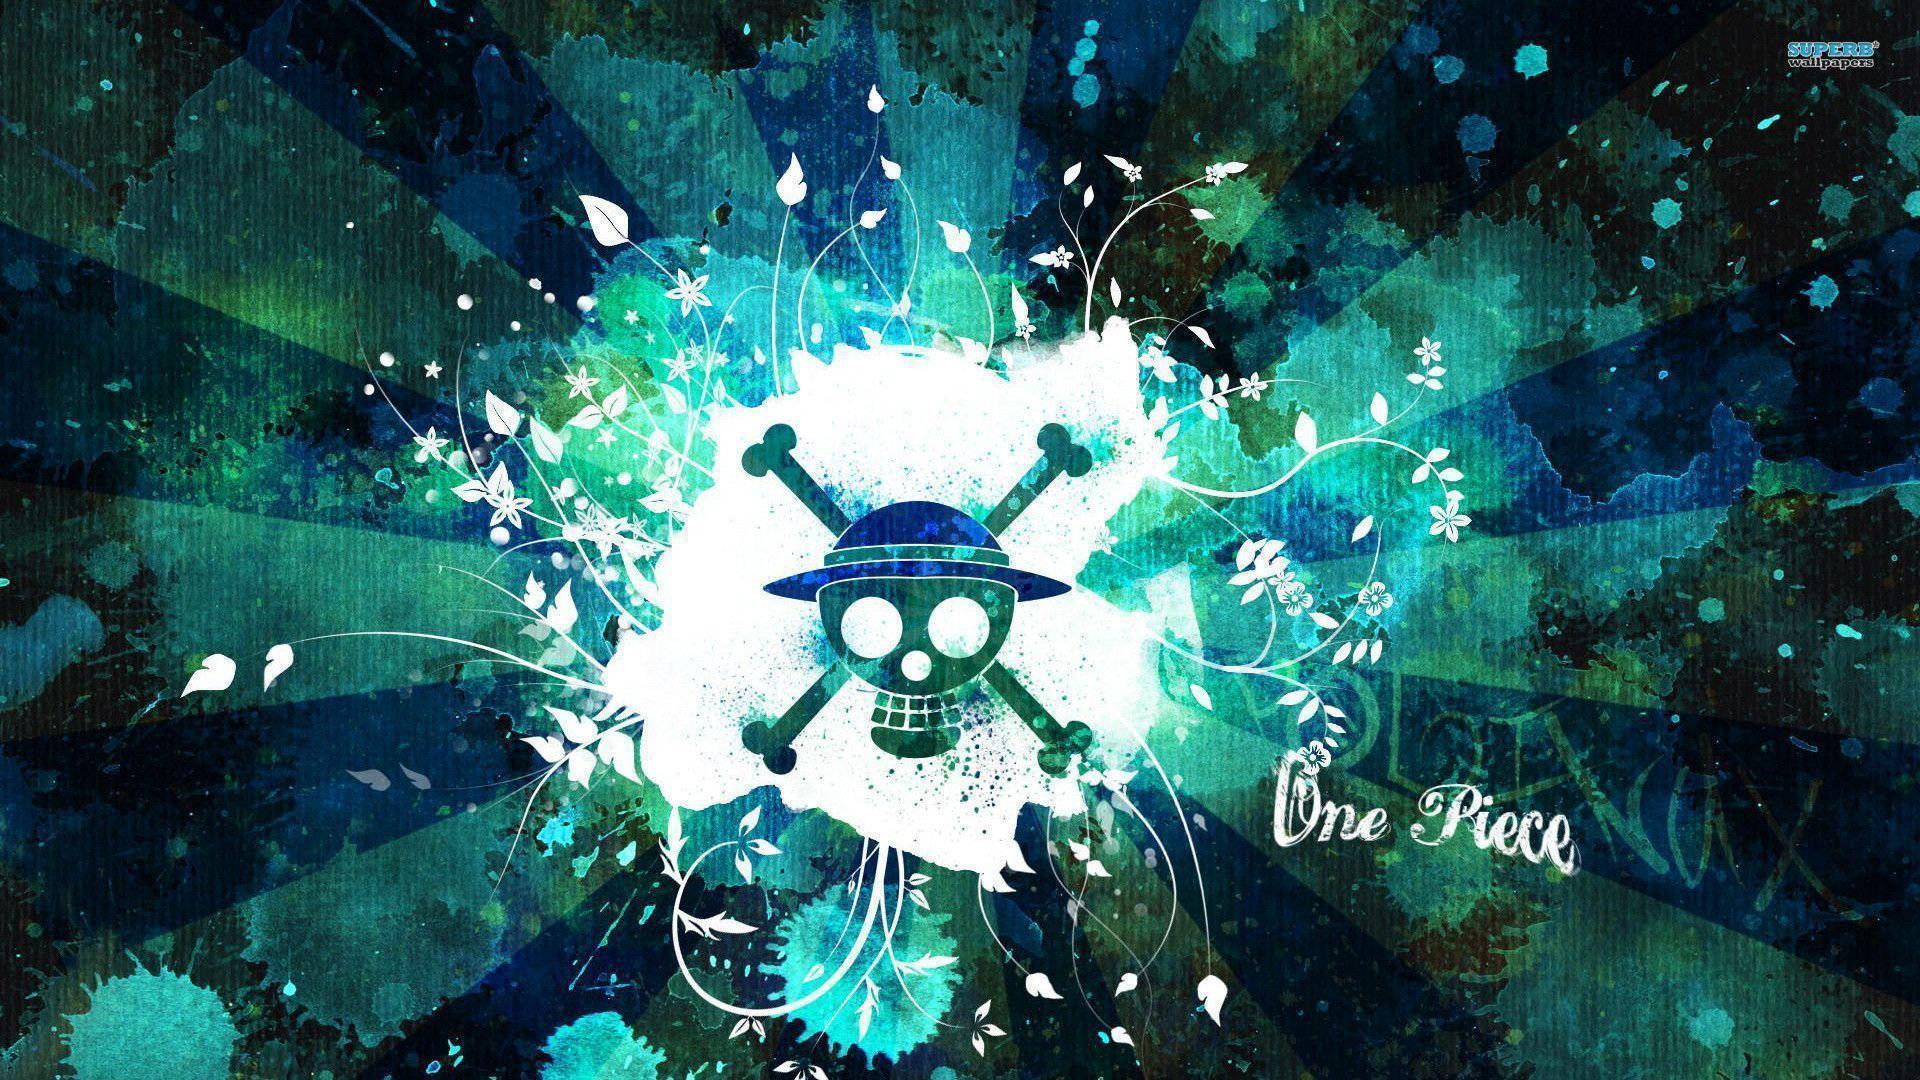 One Piece Zoro Wallpapers - Wallpaper Cave